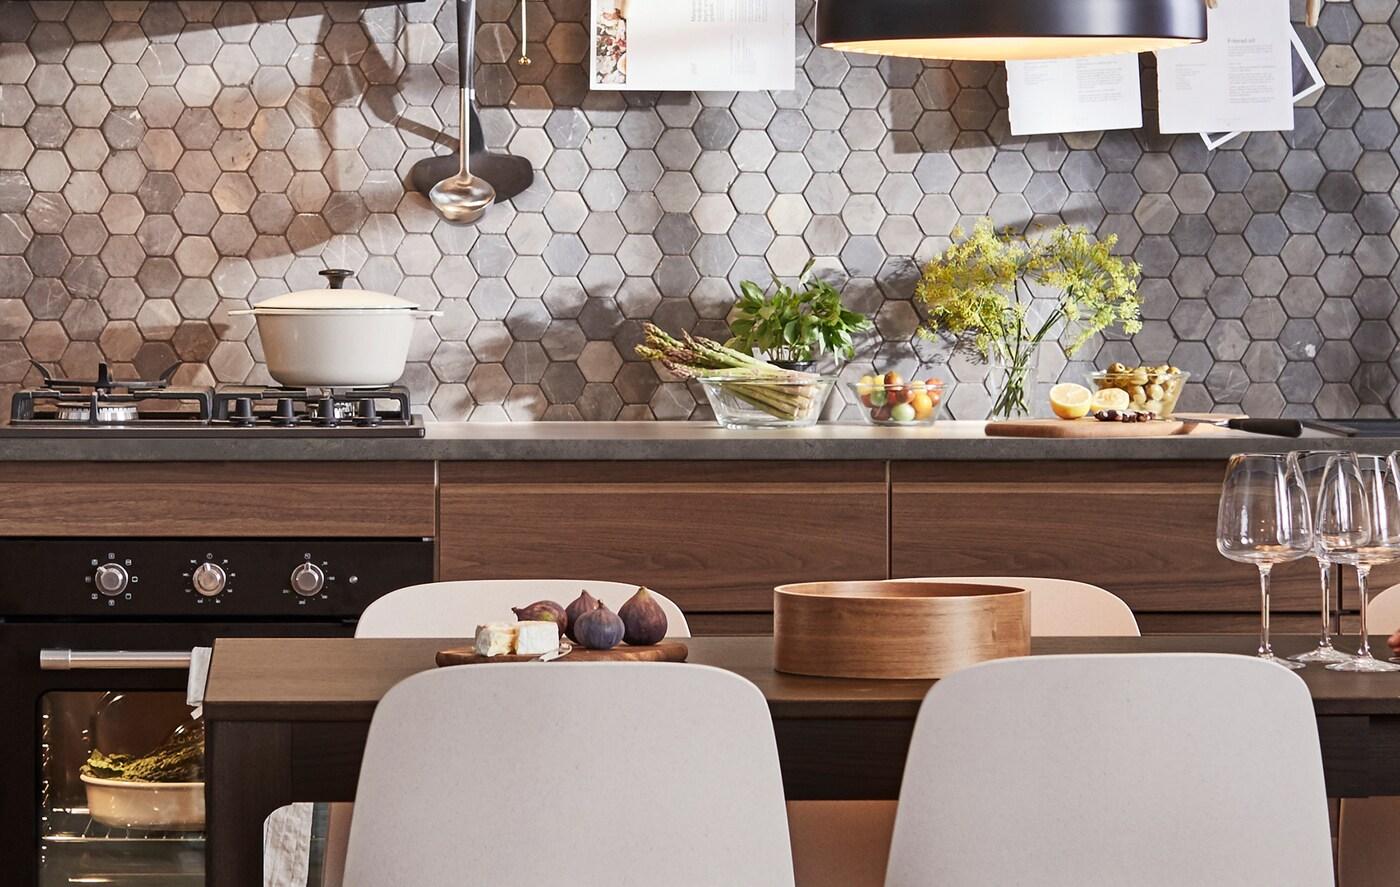 Kitchen Design Kitchen Ideas Inspiration Ikea